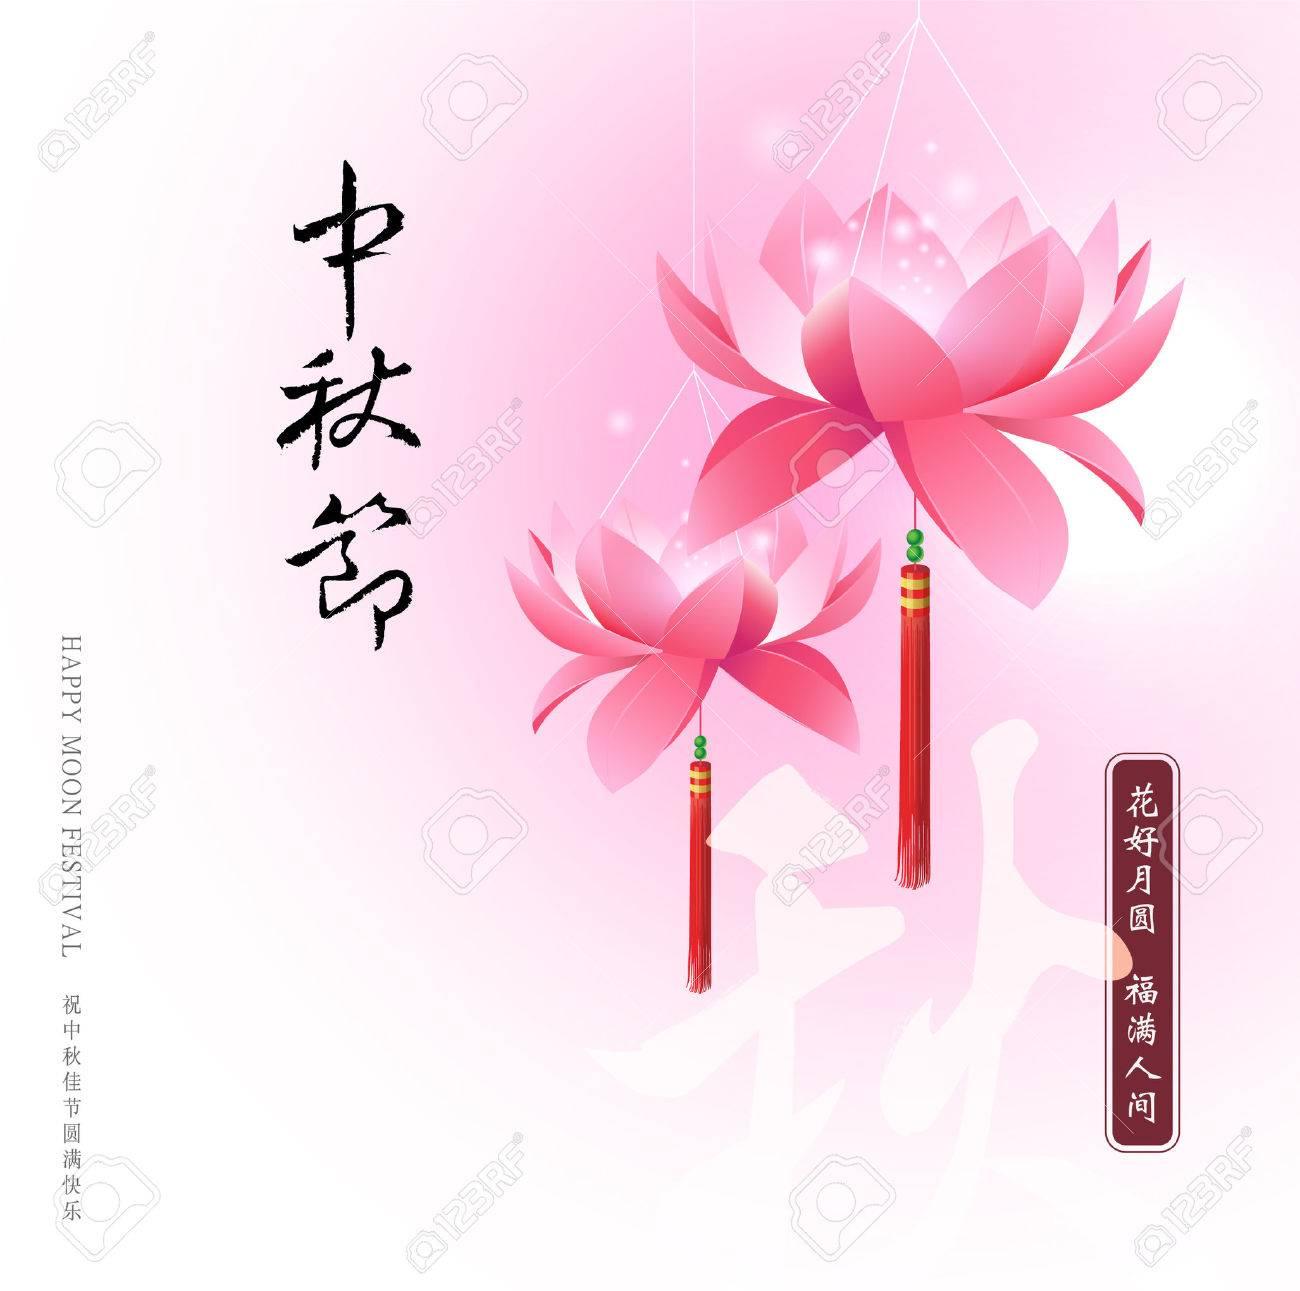 Chinese mid autumn festival graphic design - 29542703